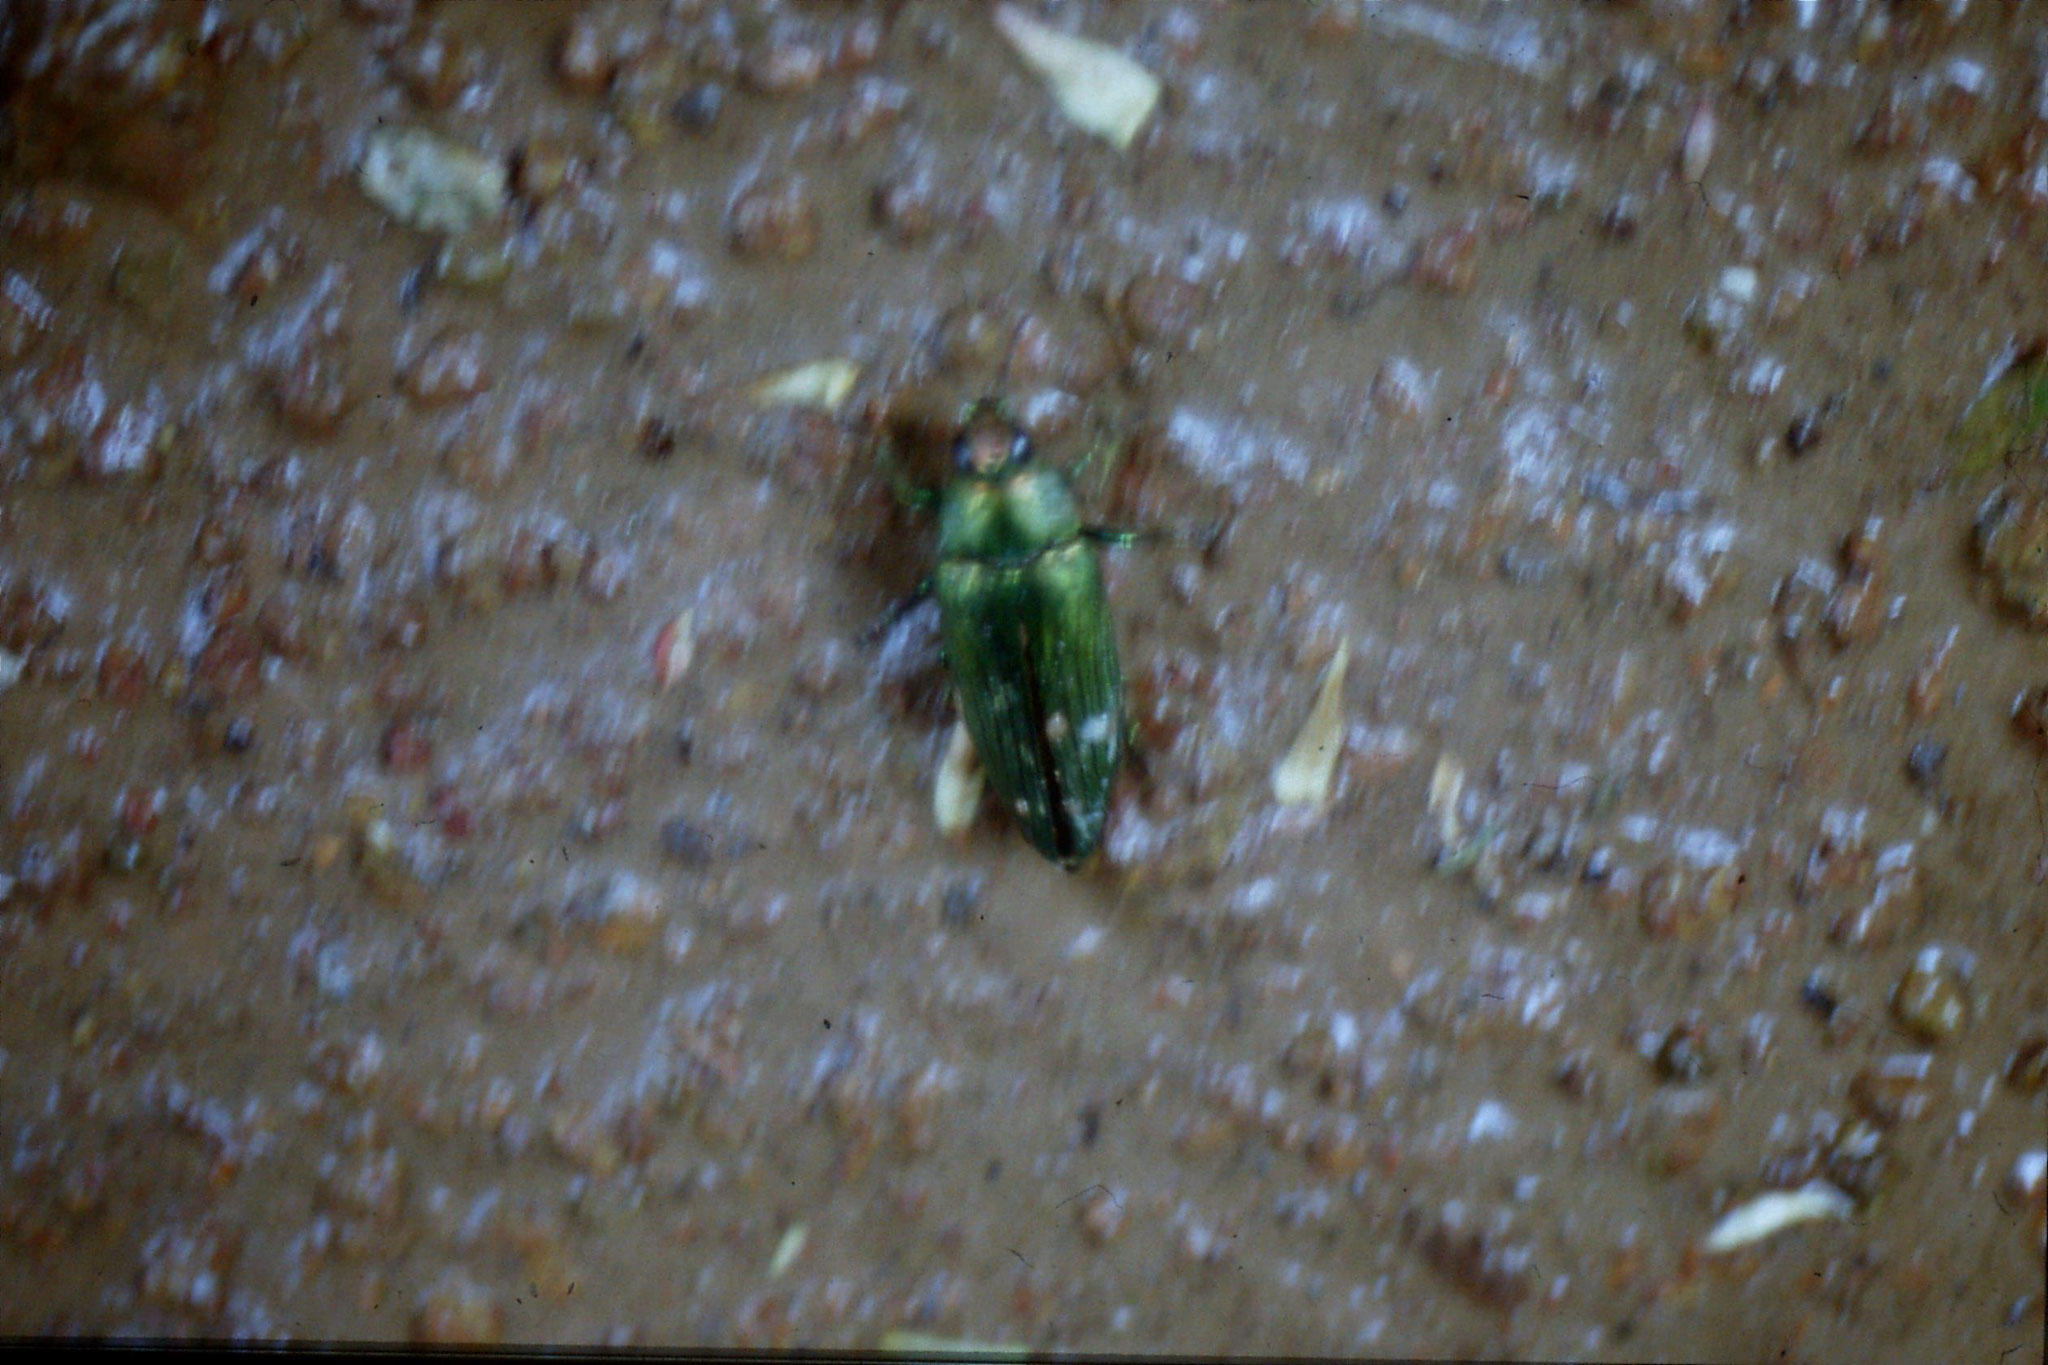 28/5/1990: 12: beetle in Mut Mee guesthouse garden